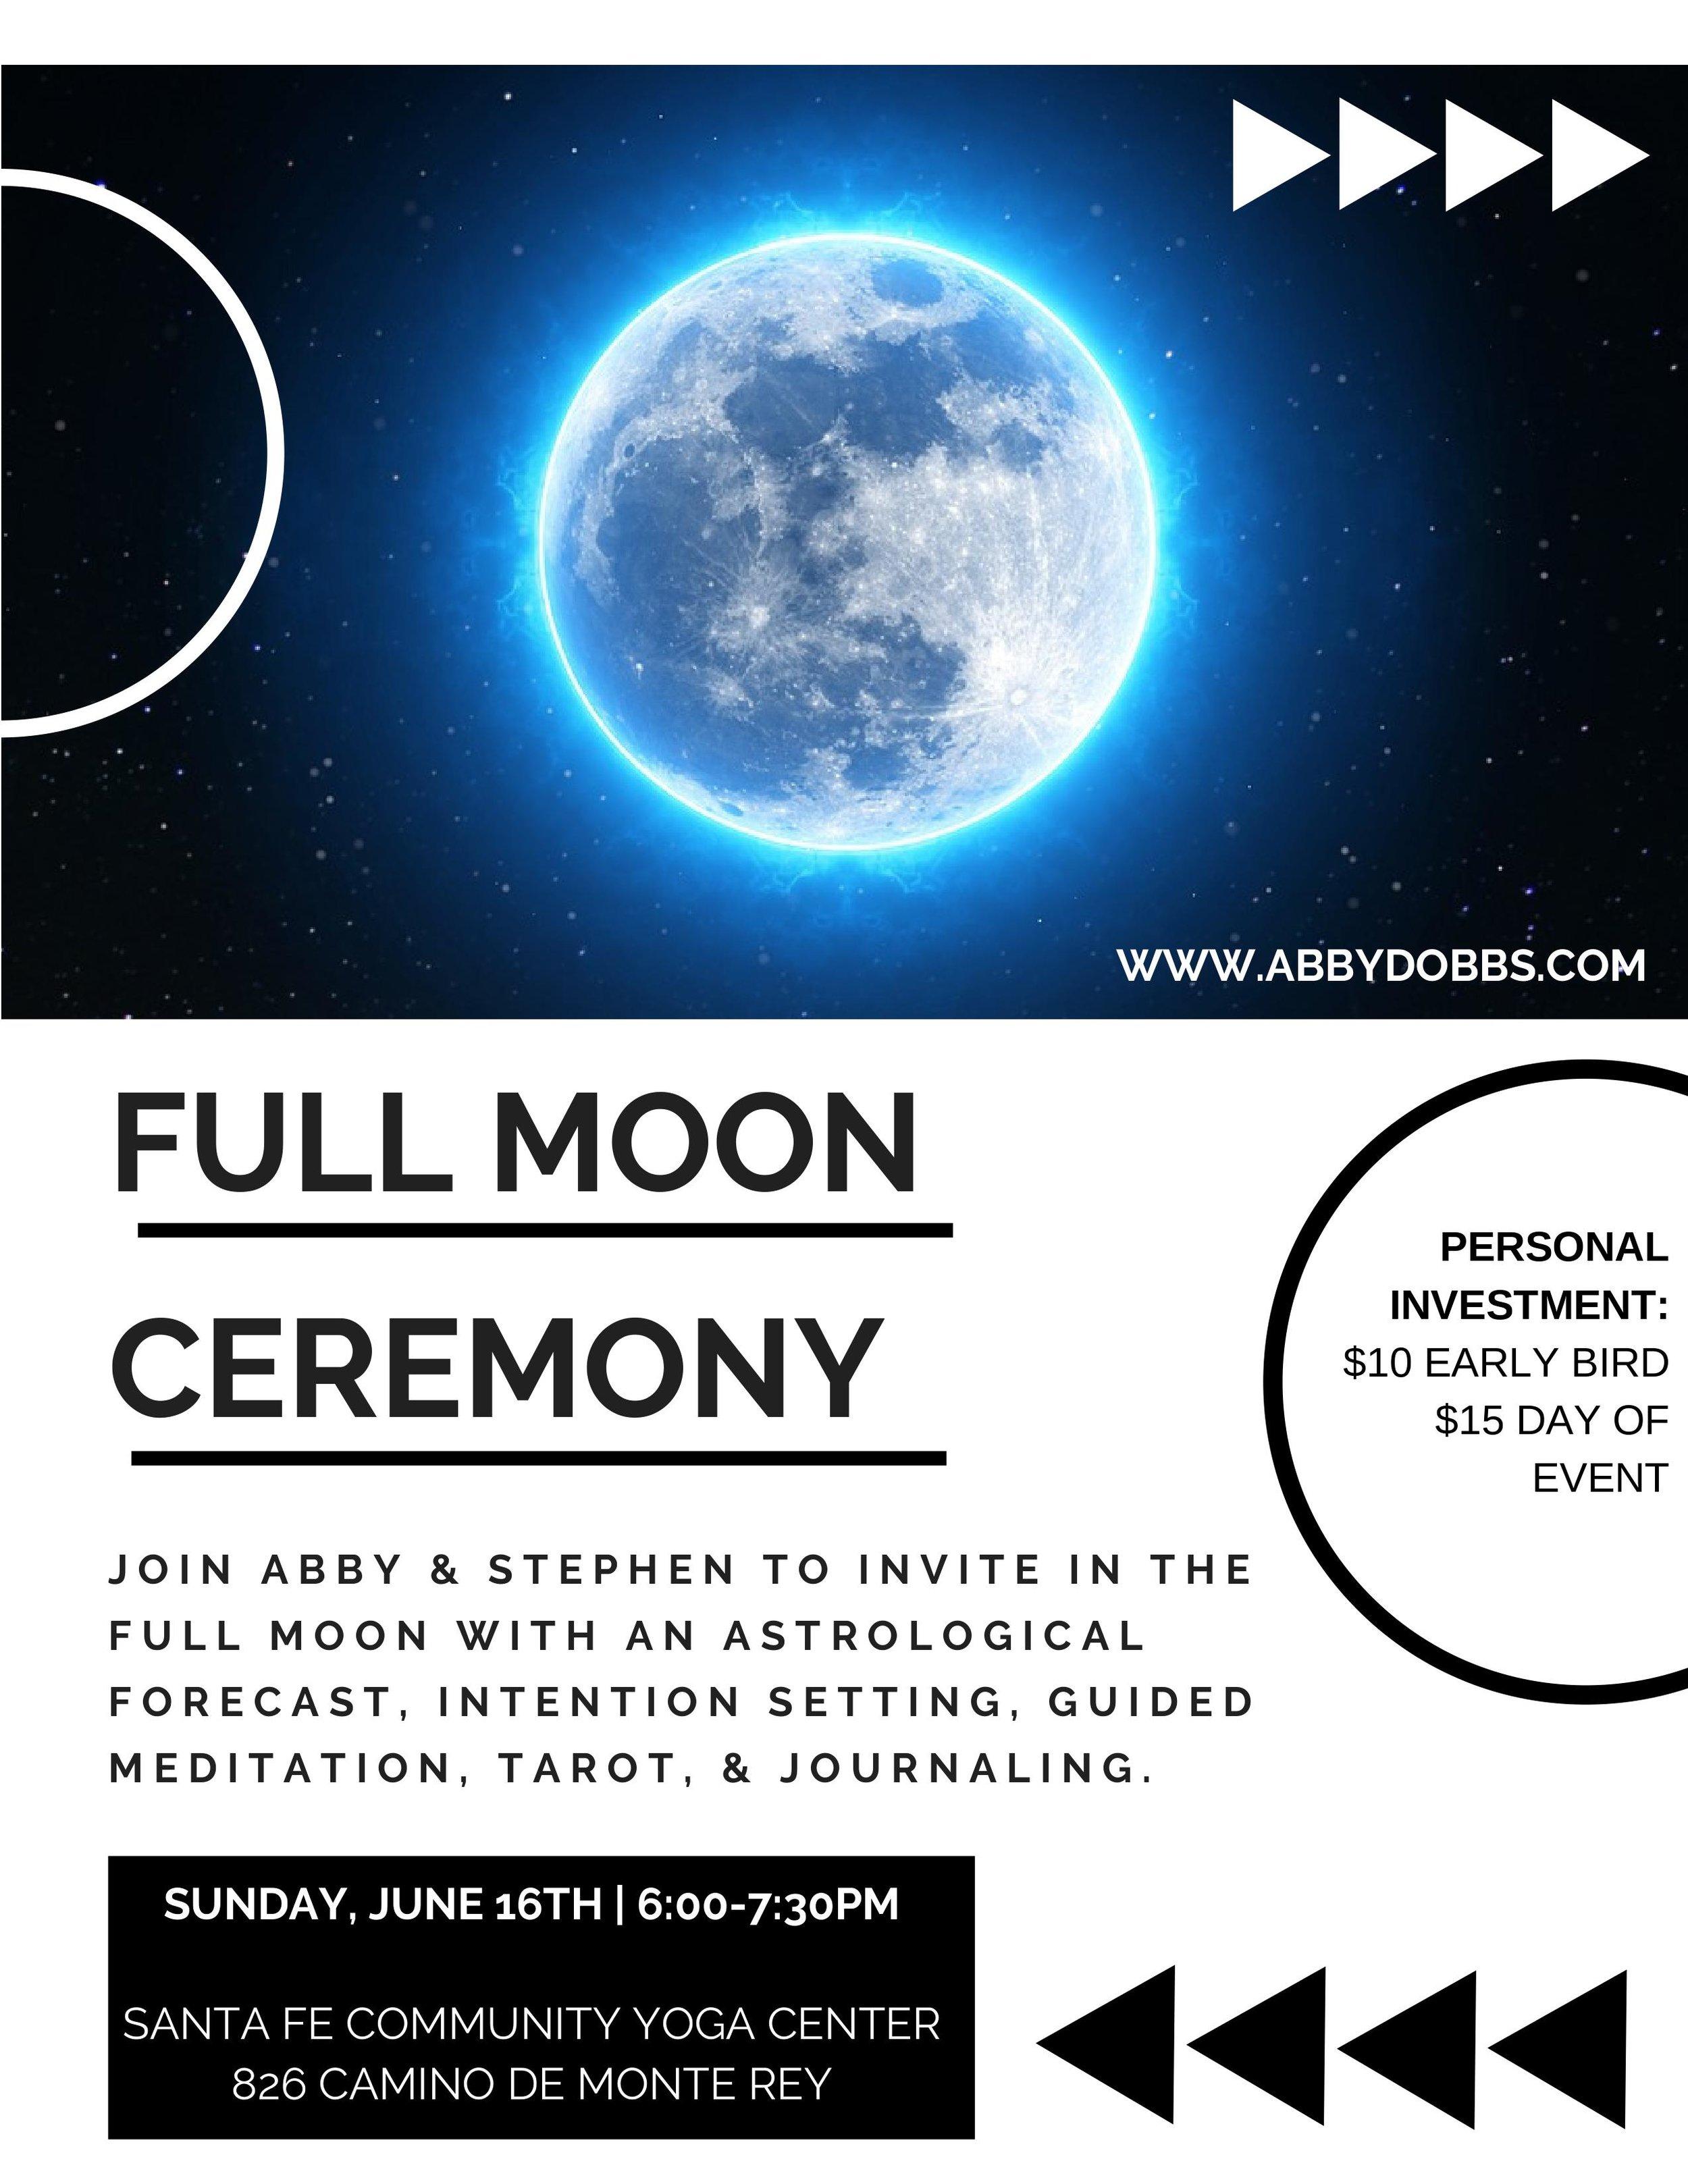 full moon ceremony.jpg